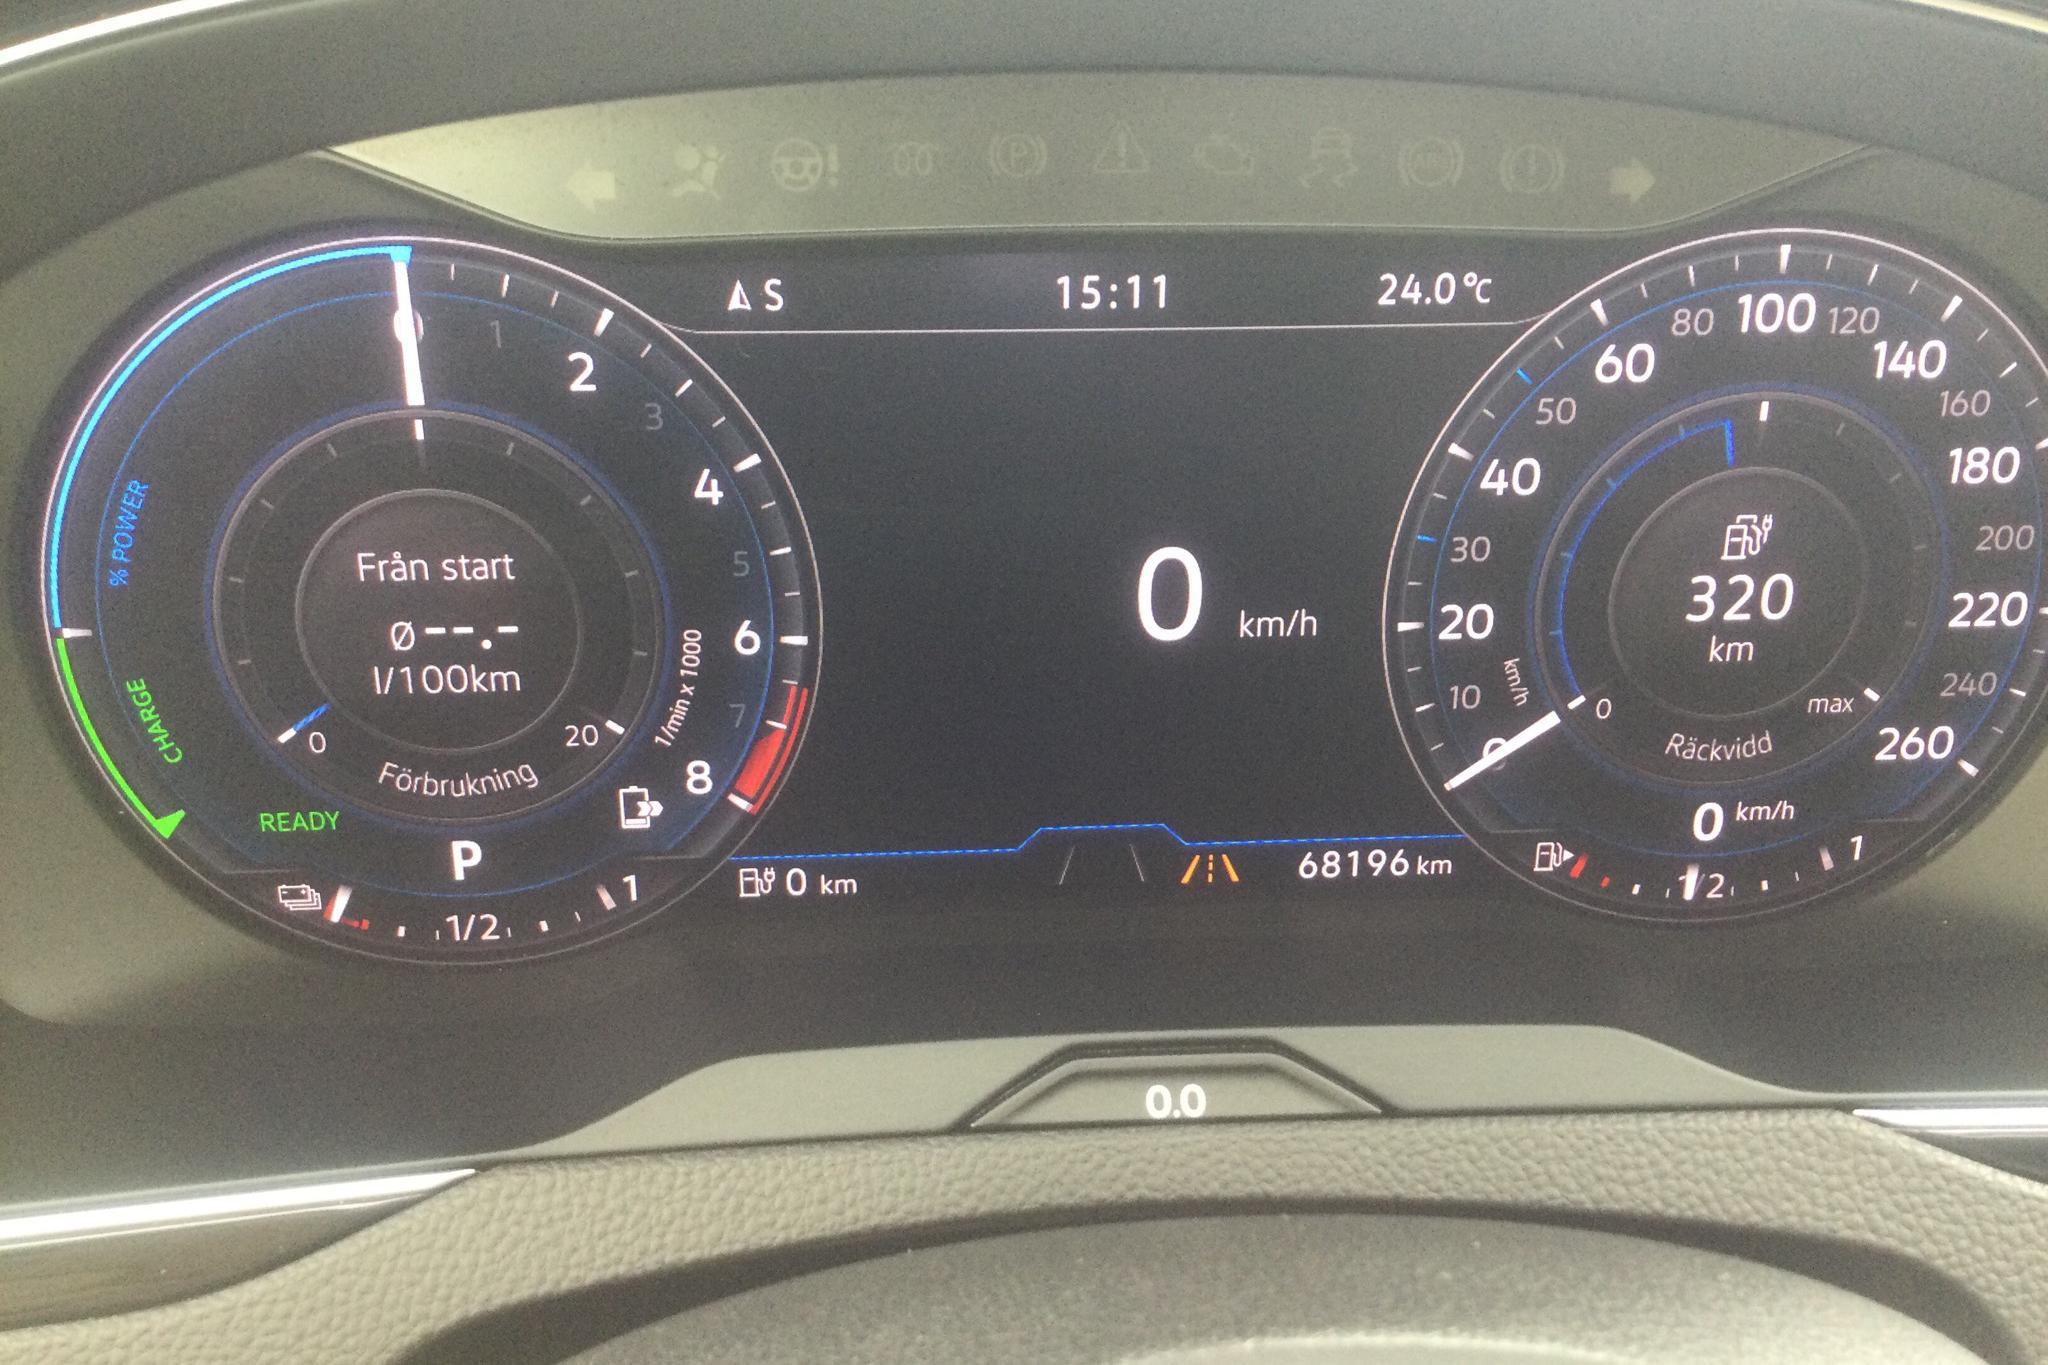 VW Passat 1.4 Plug-in-Hybrid Sportscombi (218hk) - 68 190 km - Automatic - white - 2018